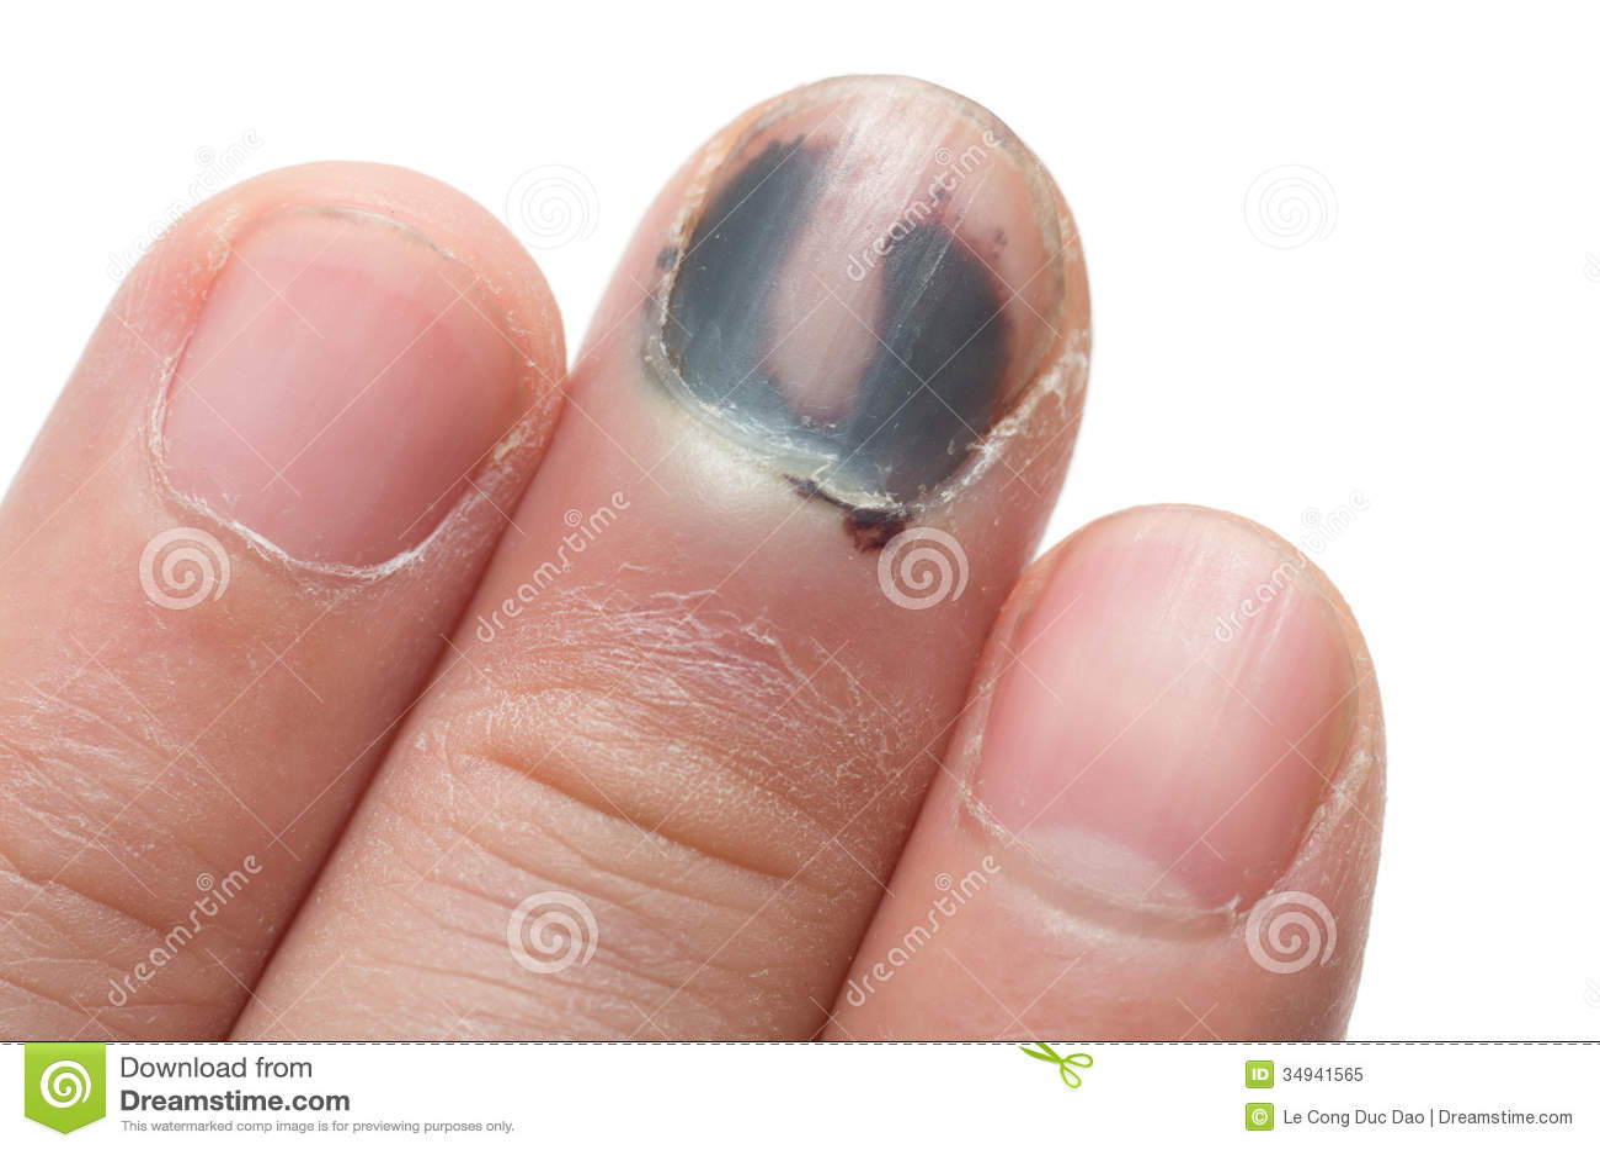 Middle Finger With Bruised Nail Subungual Hematoma On White Background Royalty Free Stock Photo